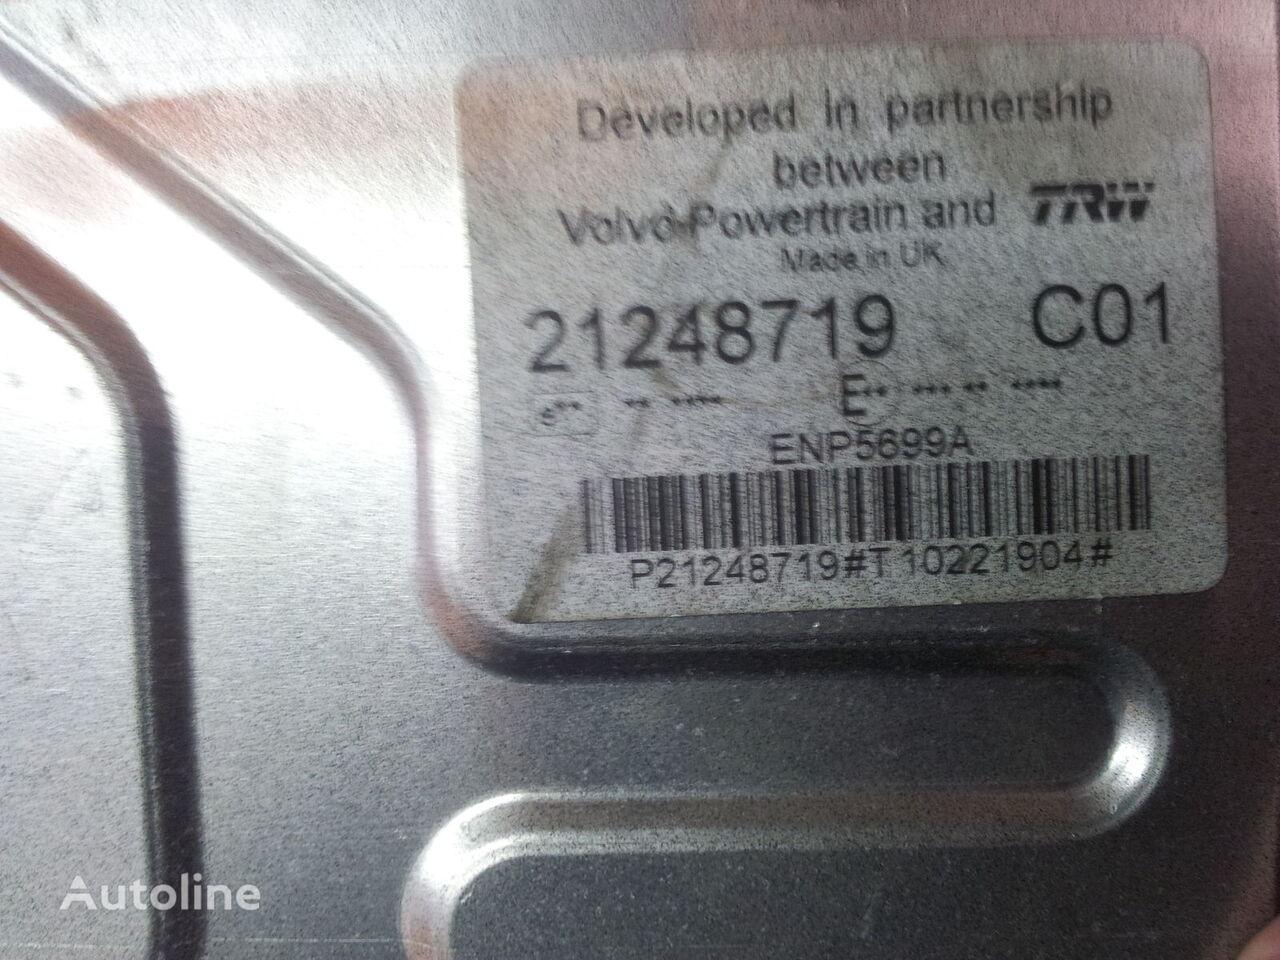 Volvo Fh4  Renault T Series Range  Gama Engine Control Unit  Wiring Ha  Volvo Fh4  Renault T